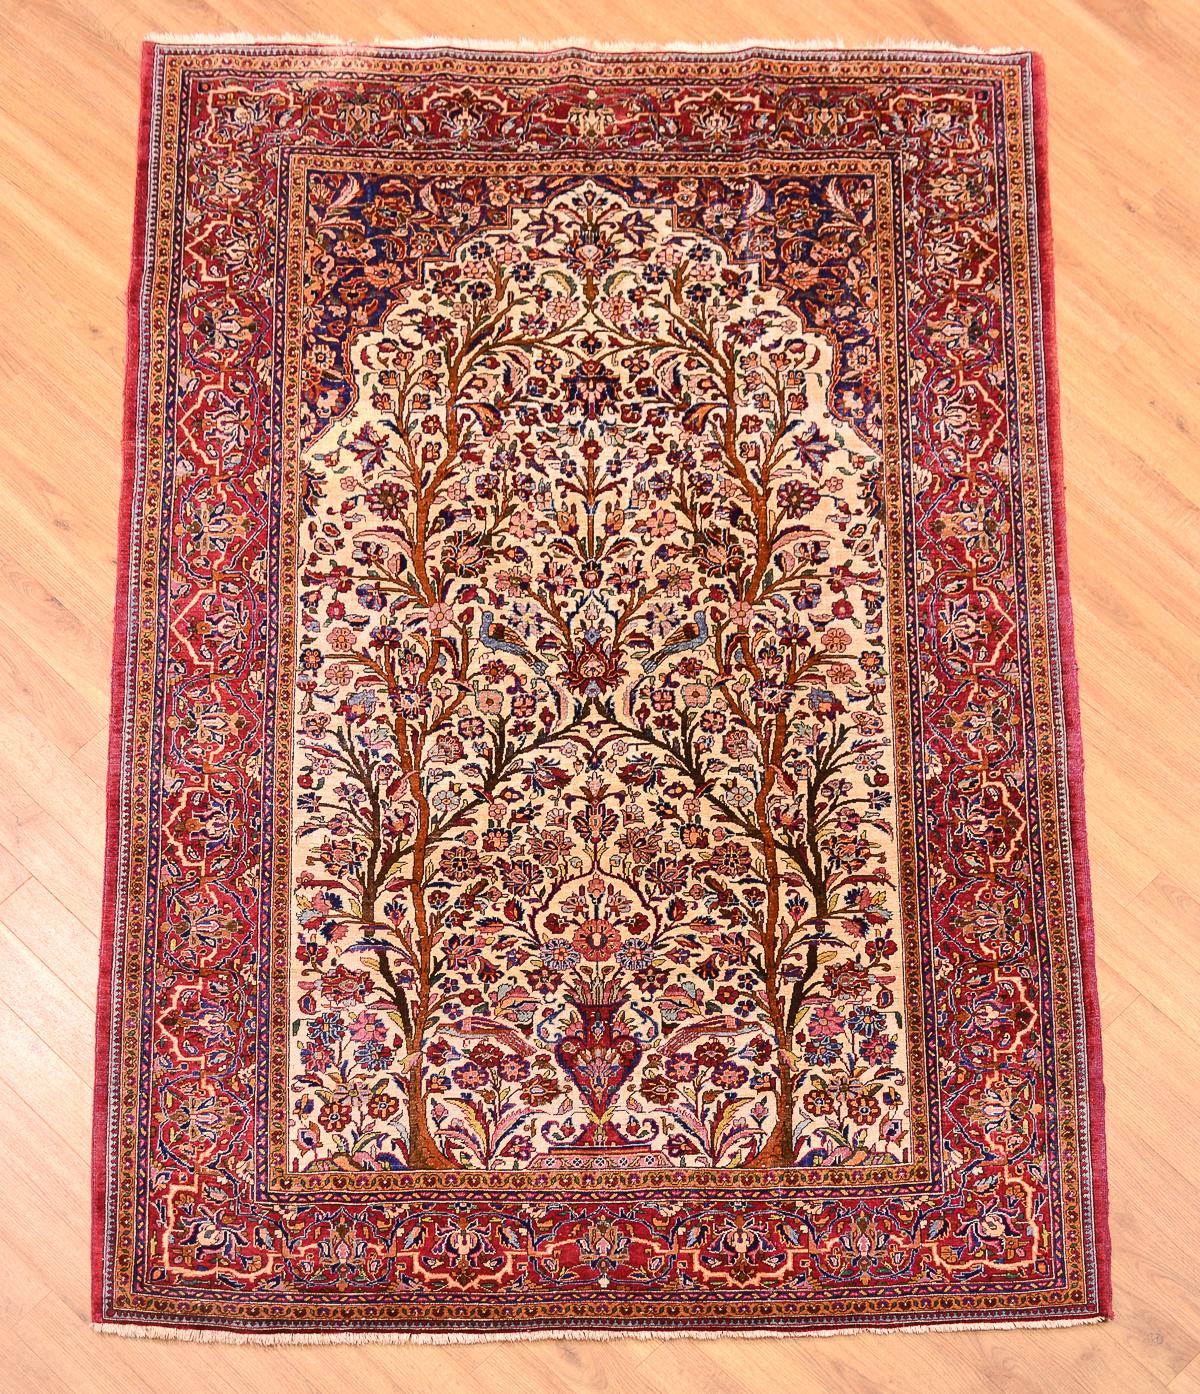 Semi Antique Silk Kashan Rug 1 96x1 31m The Oriental Rug